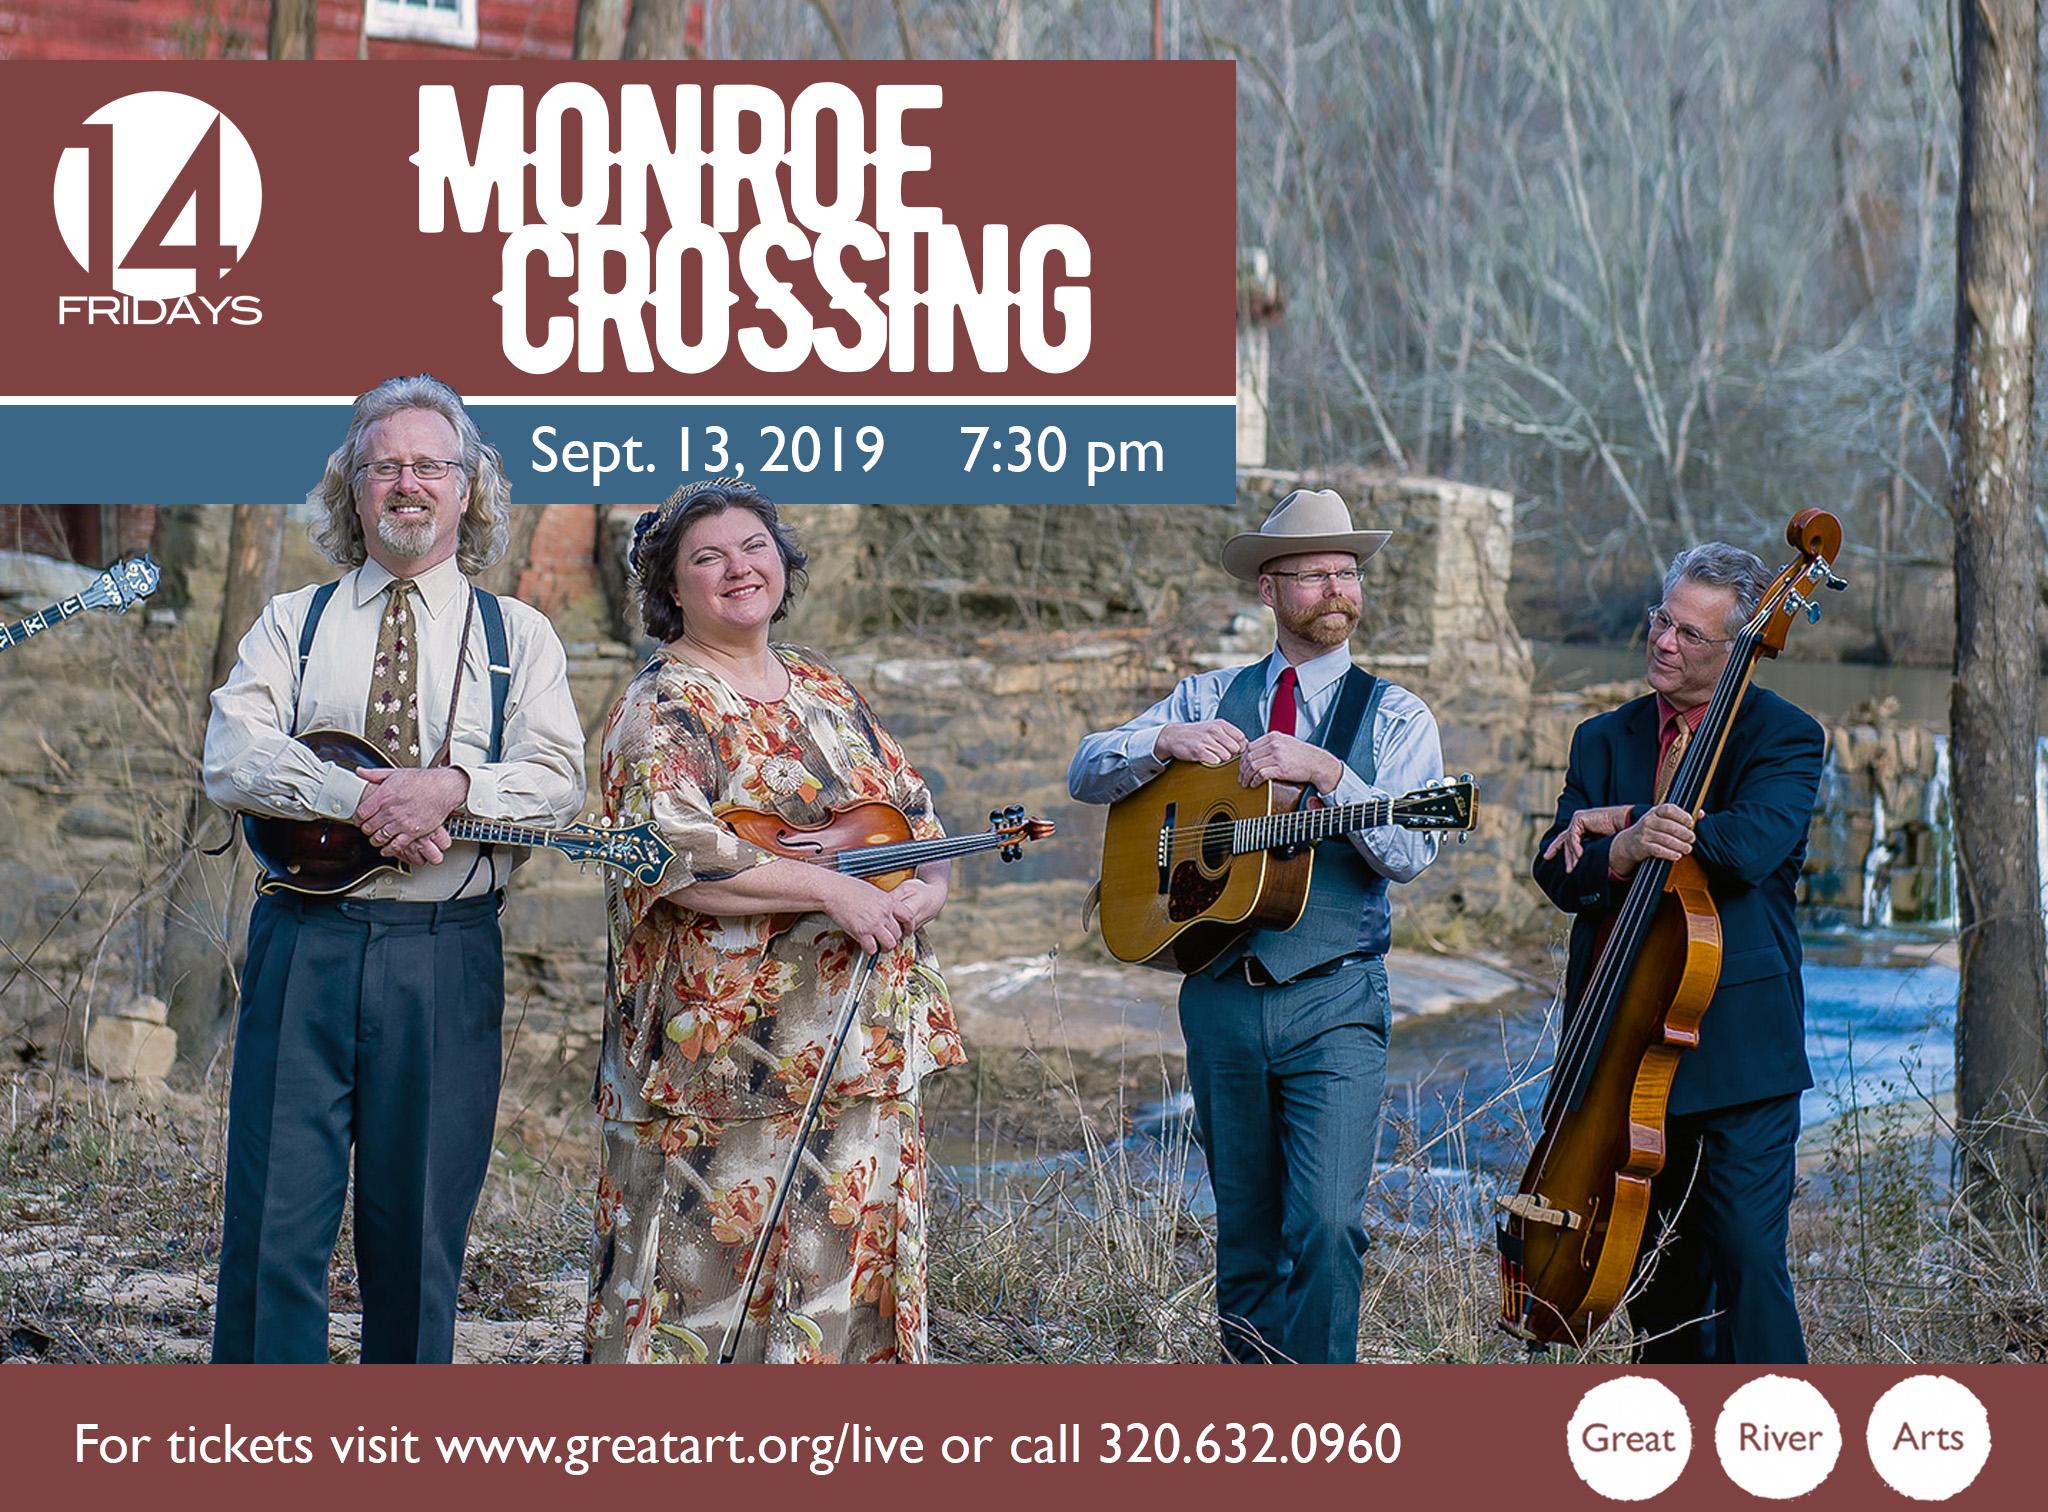 MonroeCrossing-banner.jpg